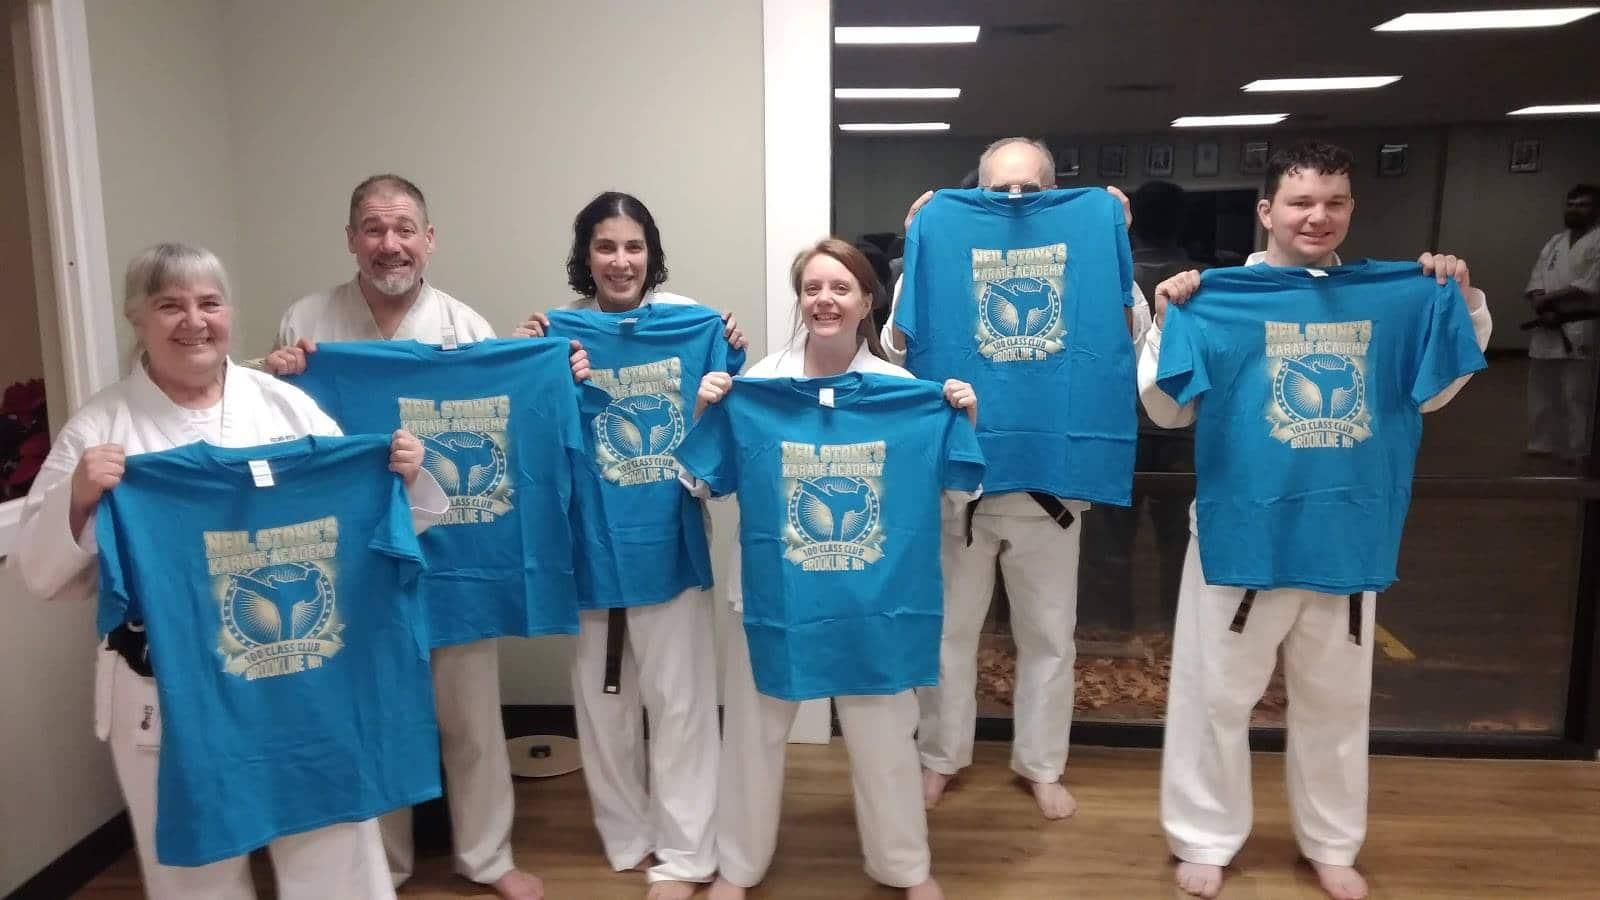 Neil Stone Karate Students getting 100 class Tshirts